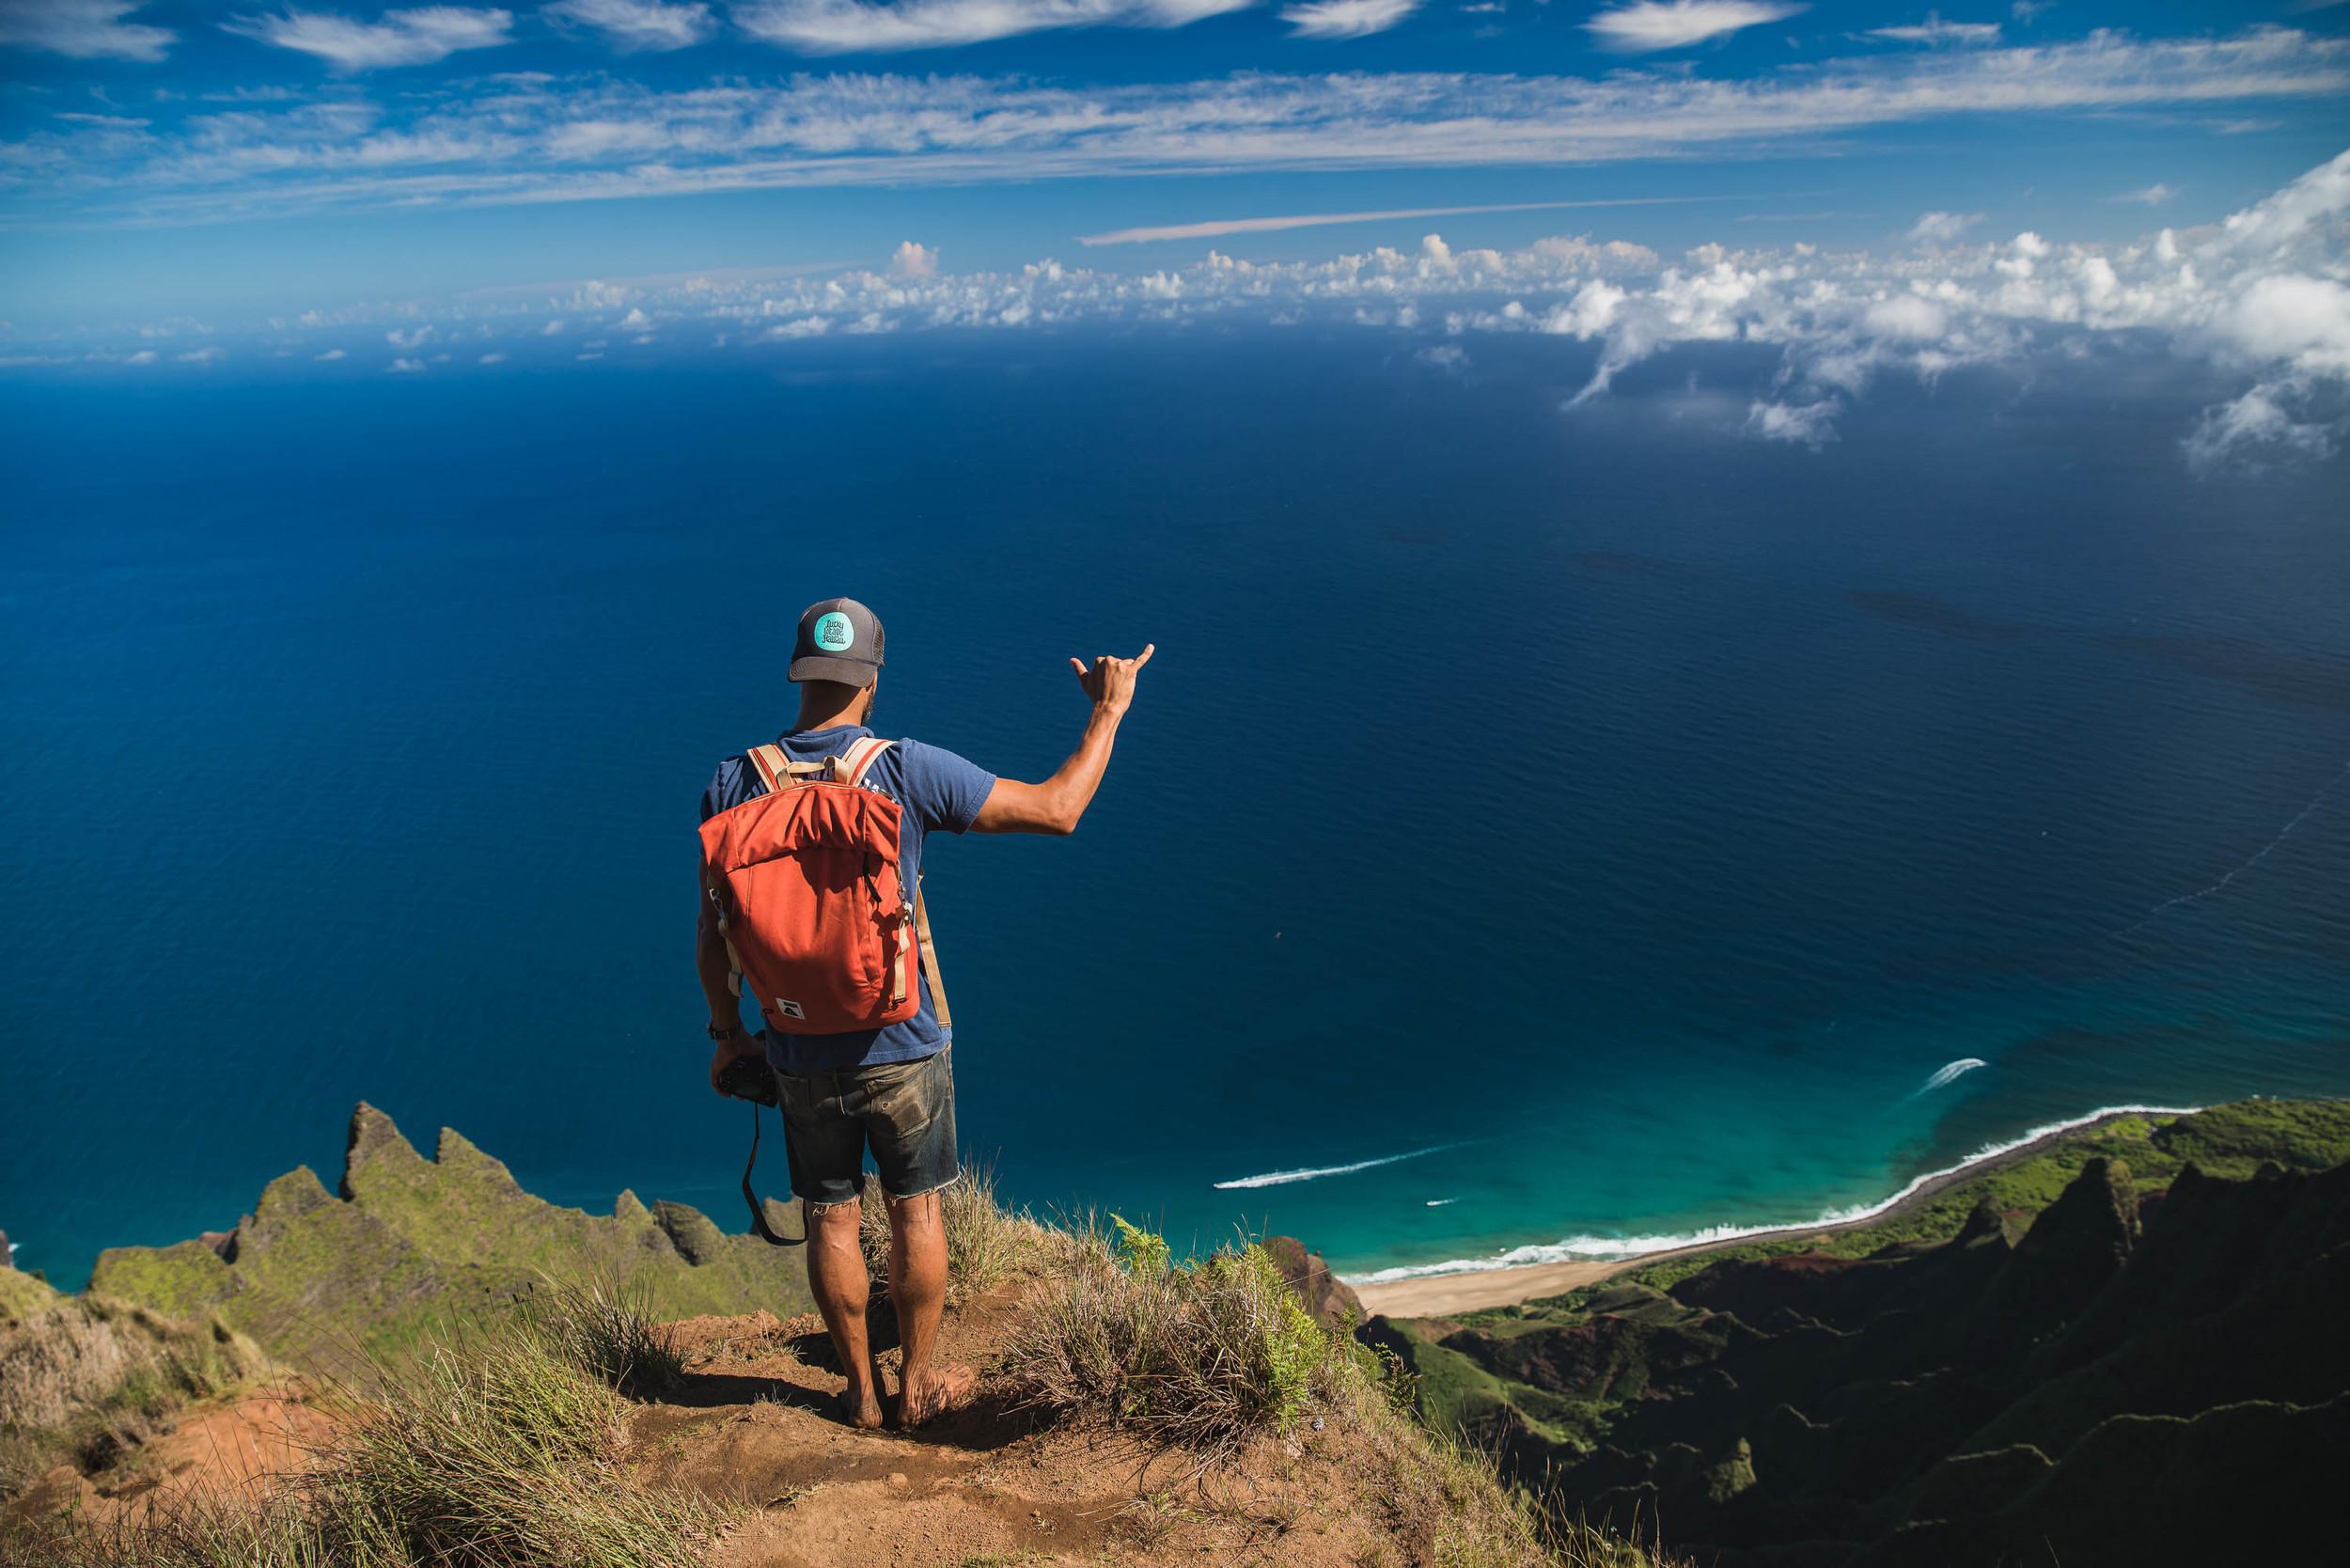 bryce-johnson-kalalau-ridge-kauai-hiking-hammock-palmwood-aloha-exchange-9.jpg